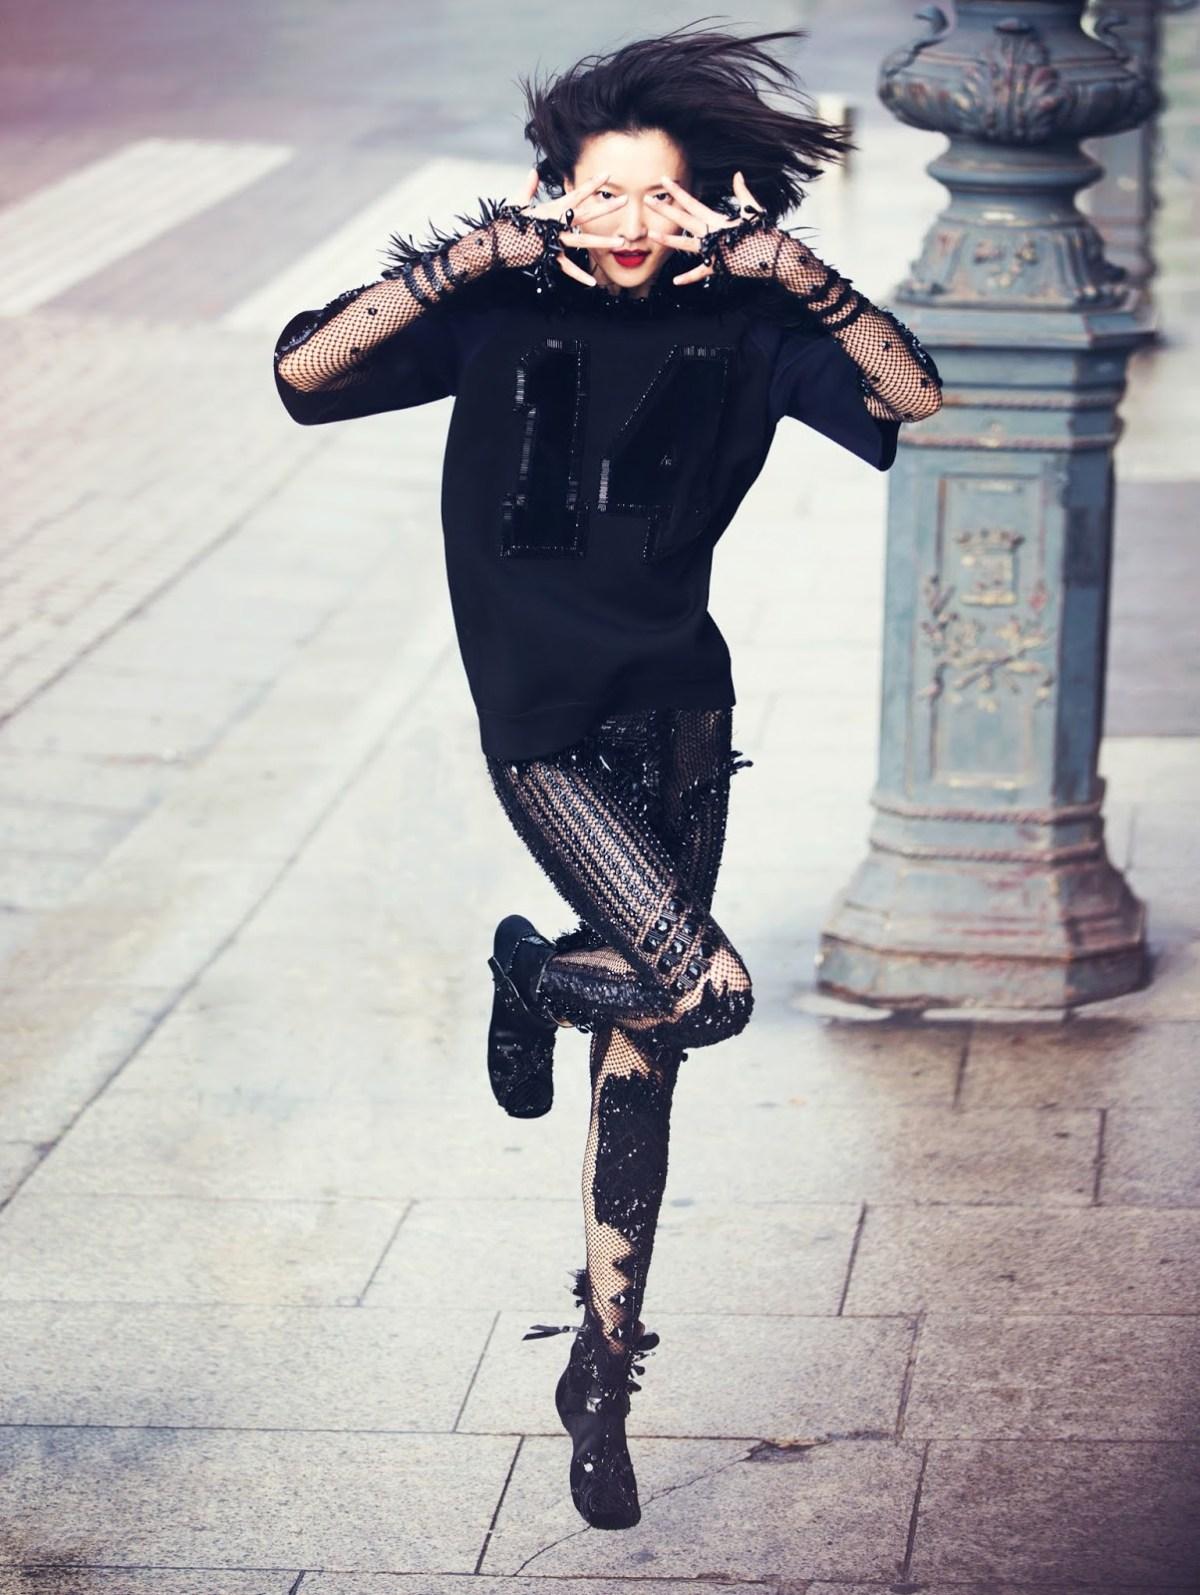 Mega model Du Juan photographed by David Bellemere for Vogue China, February 2014. Image belongs to Vogue China